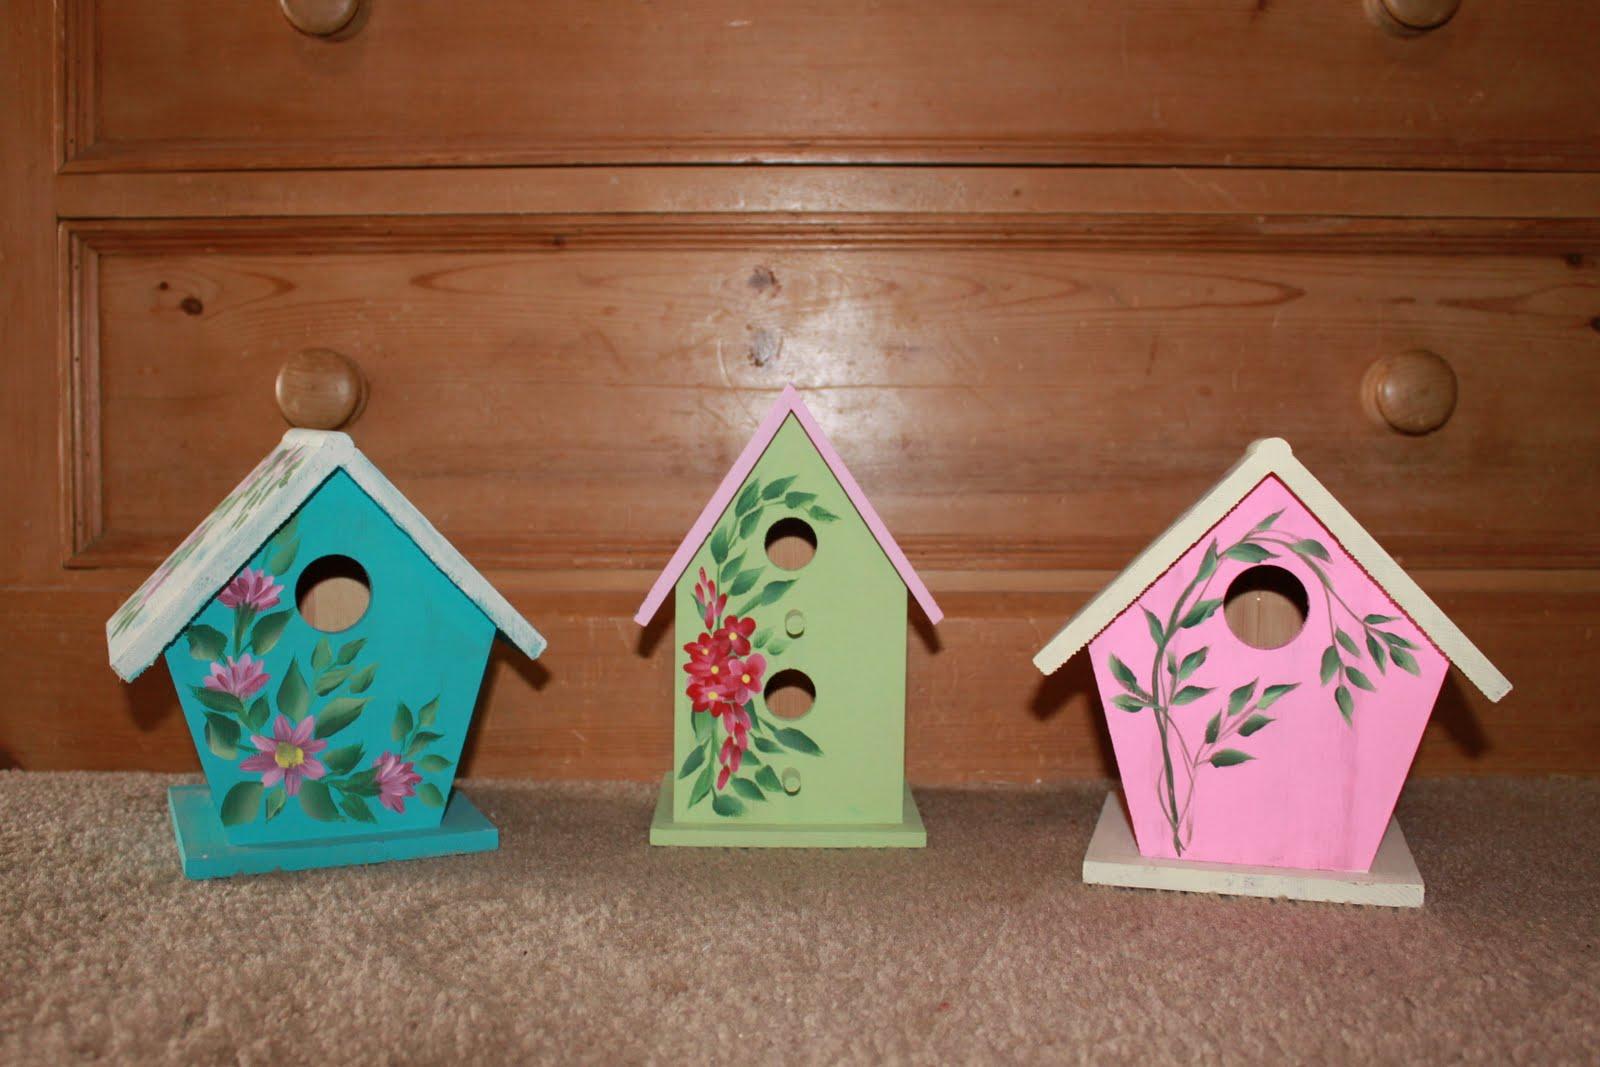 Bird house painting ideas related keywords suggestions - Bird house painting ideas ...